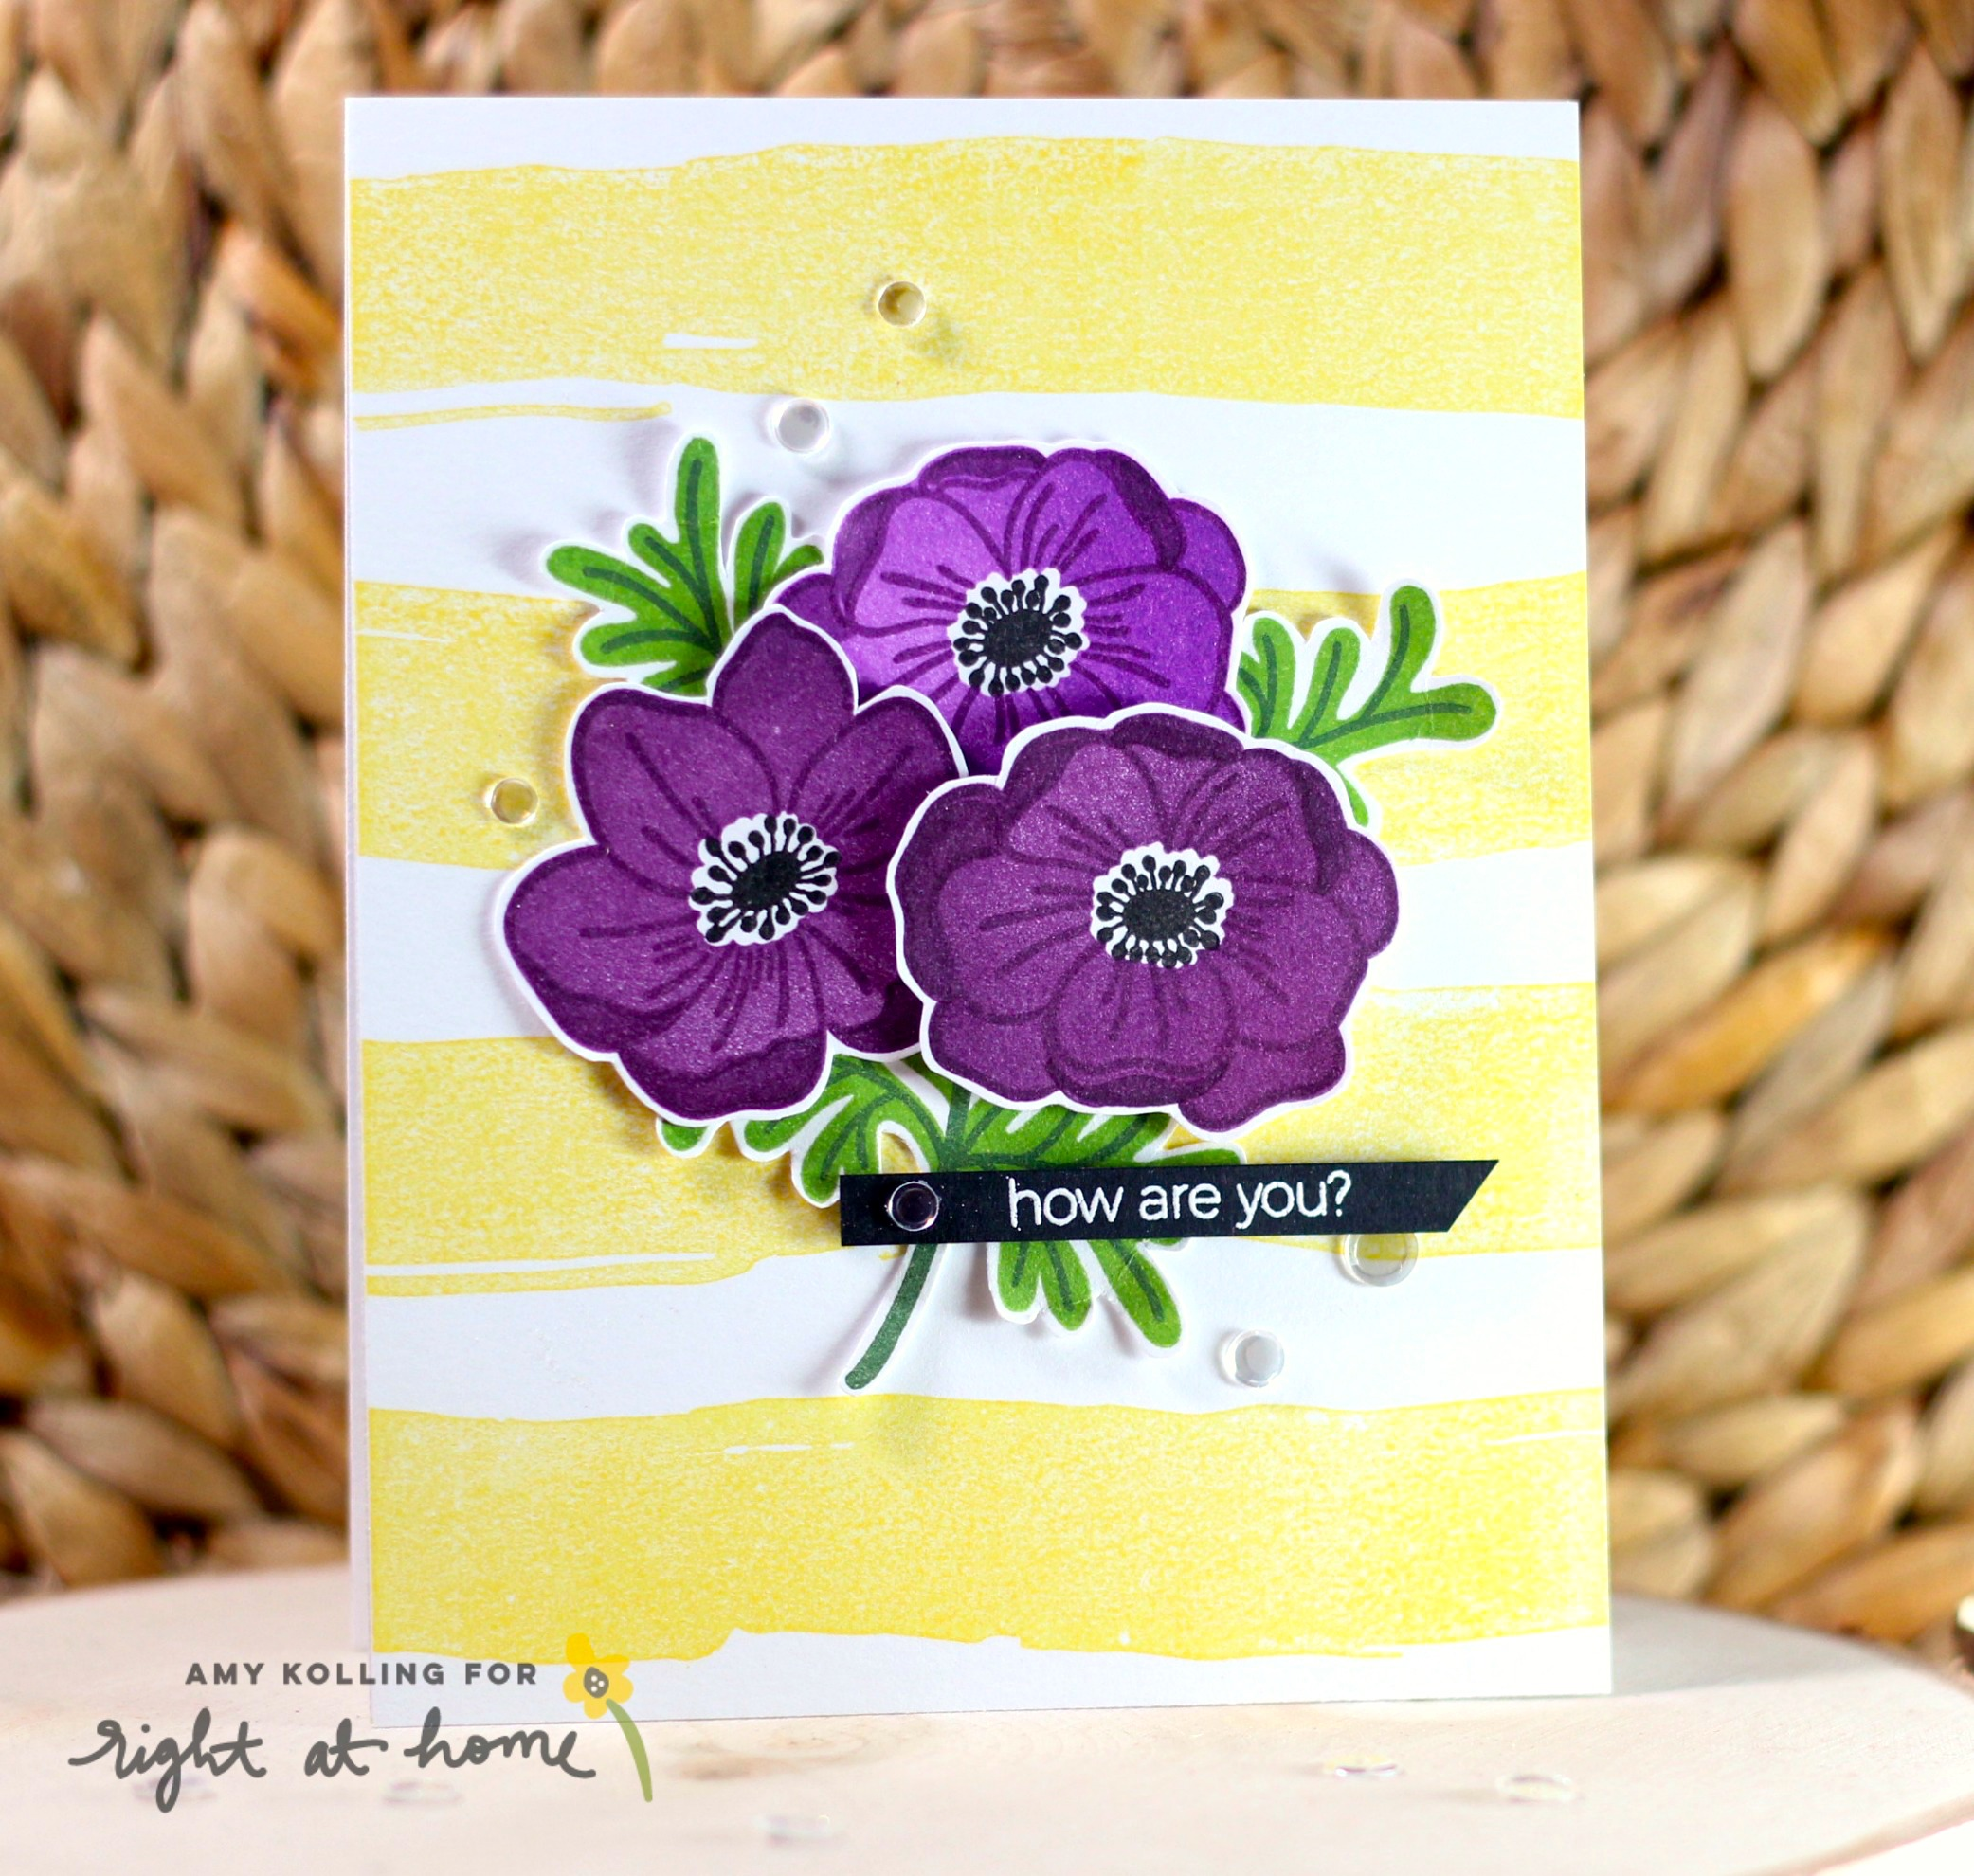 Anemone Bouquet Cards by Amy K. // rightathomeshop.com/blog